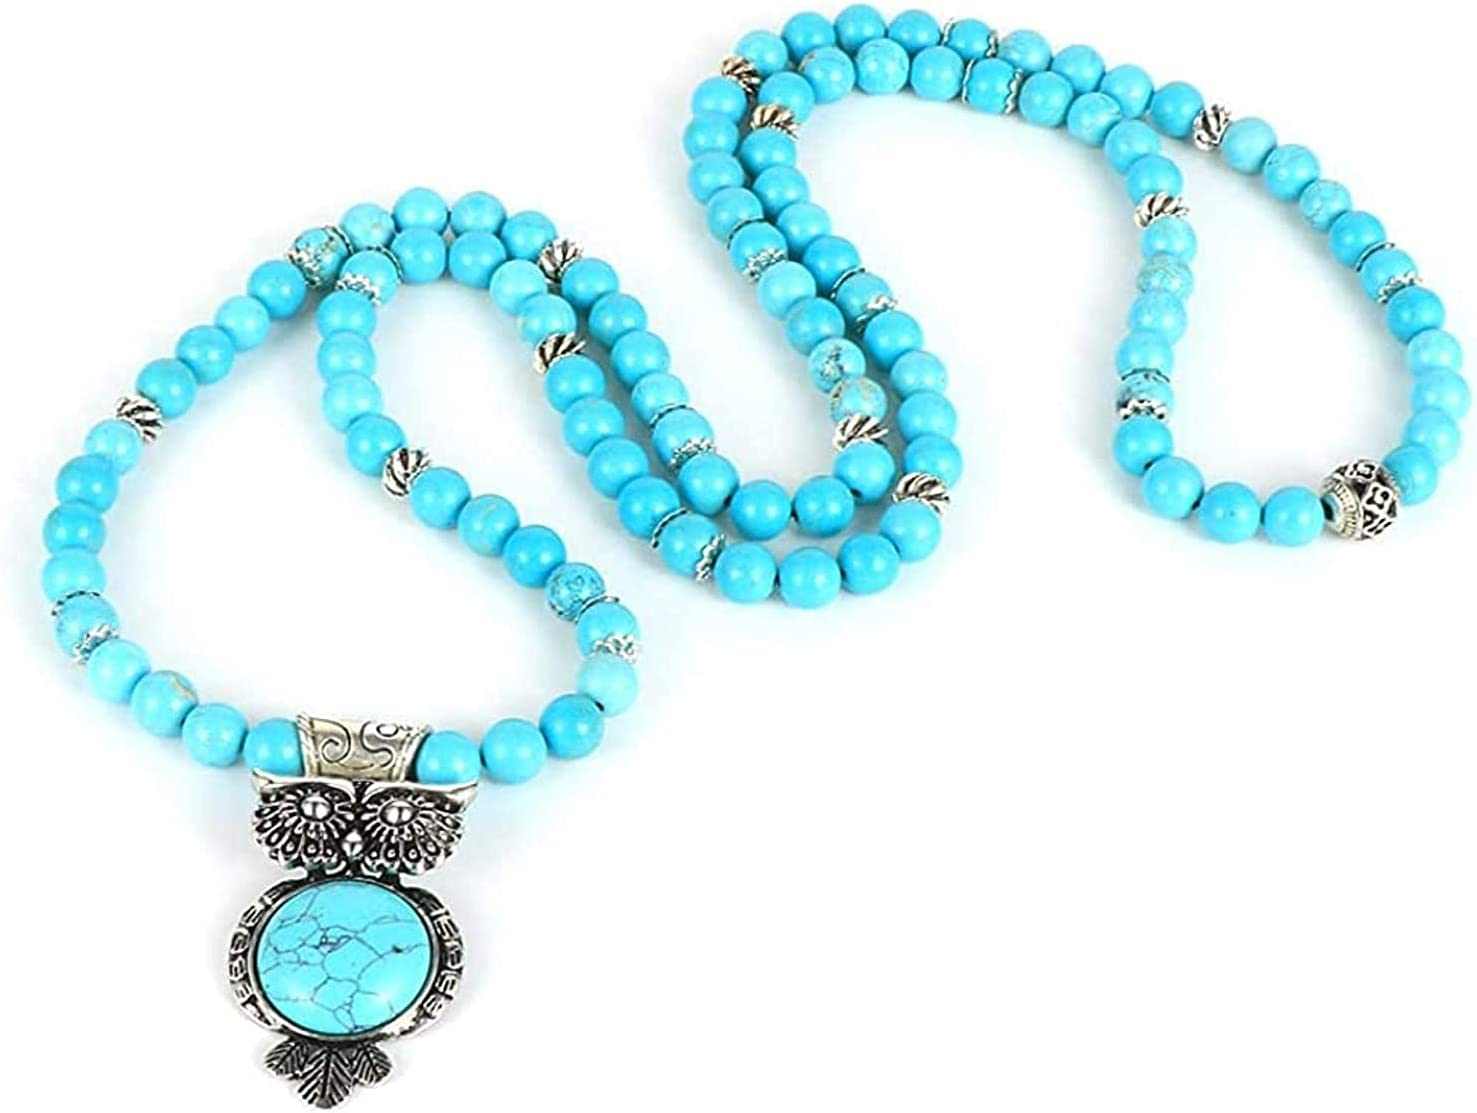 MJNYHGB Feng Shui Bead Bracelet Brand new Eye Tiger Natural Gorgeous Sto Turquoises